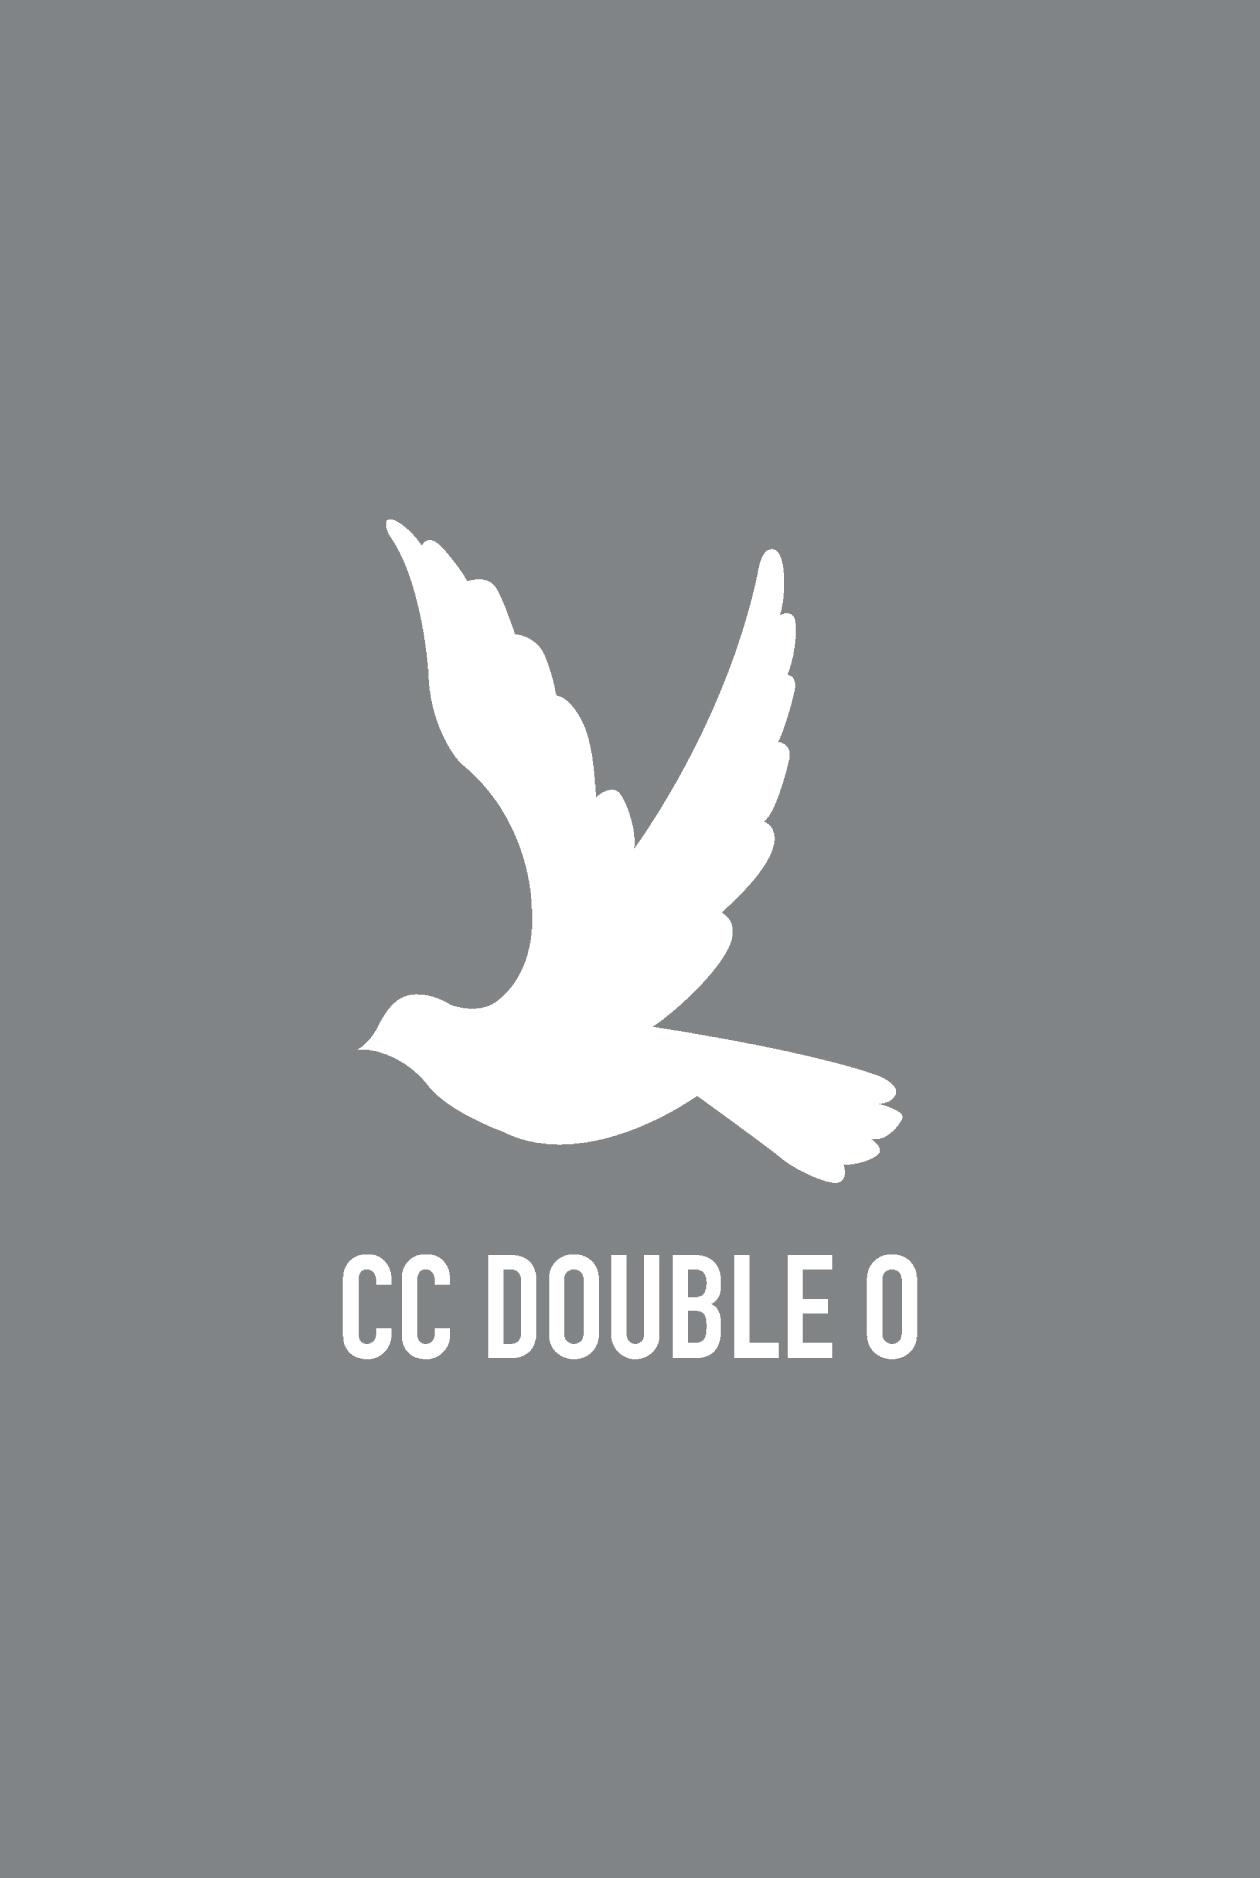 CC DOUBLE O Wash Bag with Grab Handle